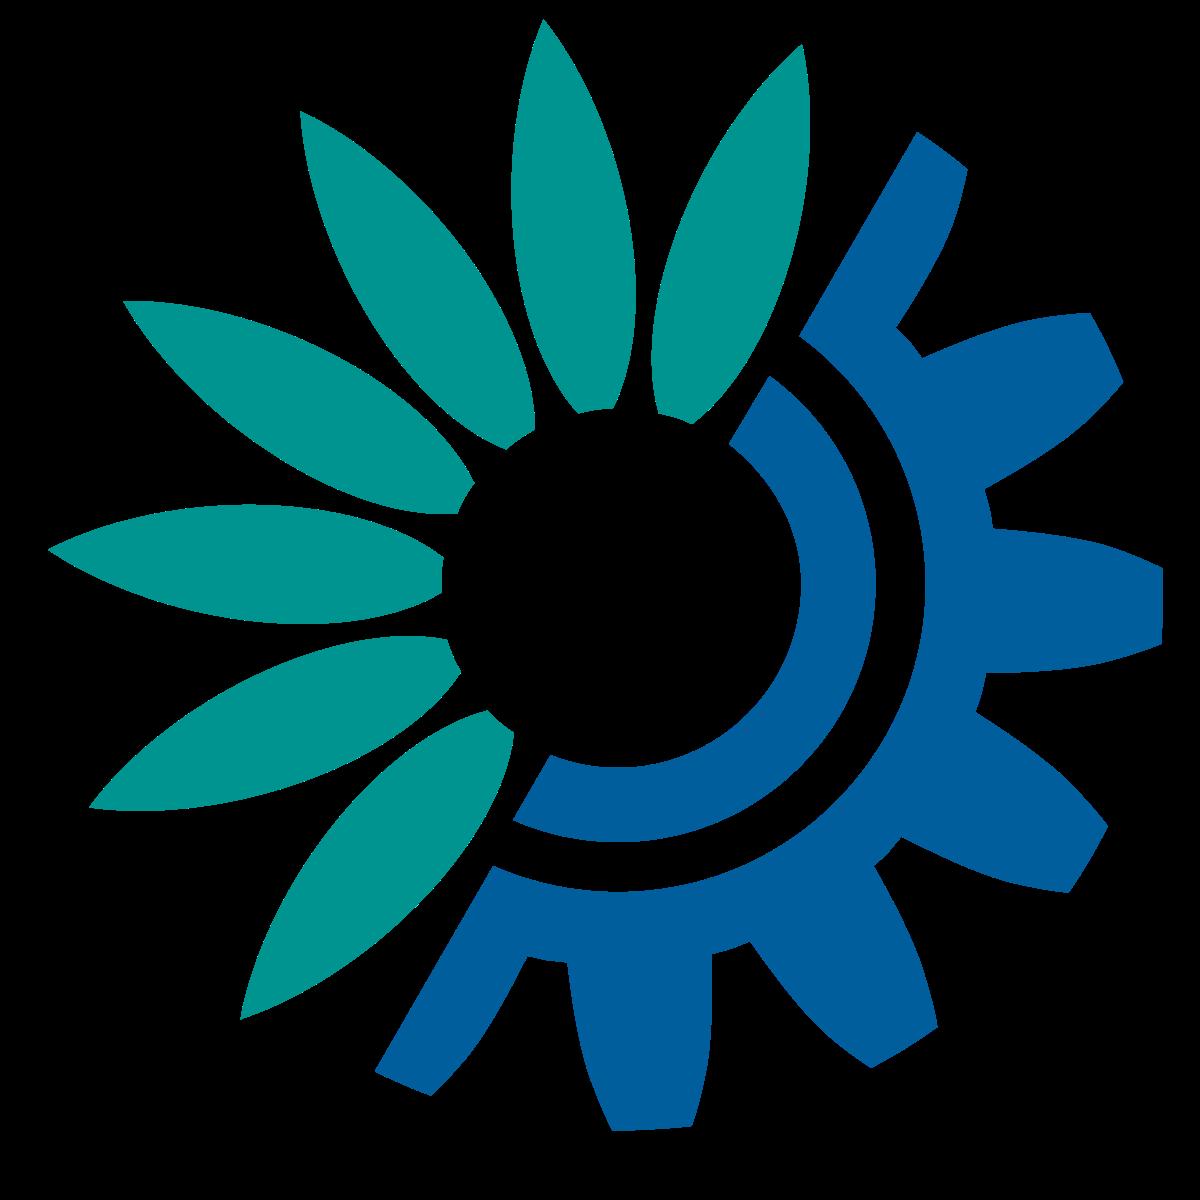 European agency wikipedia . Environment clipart environmental condition